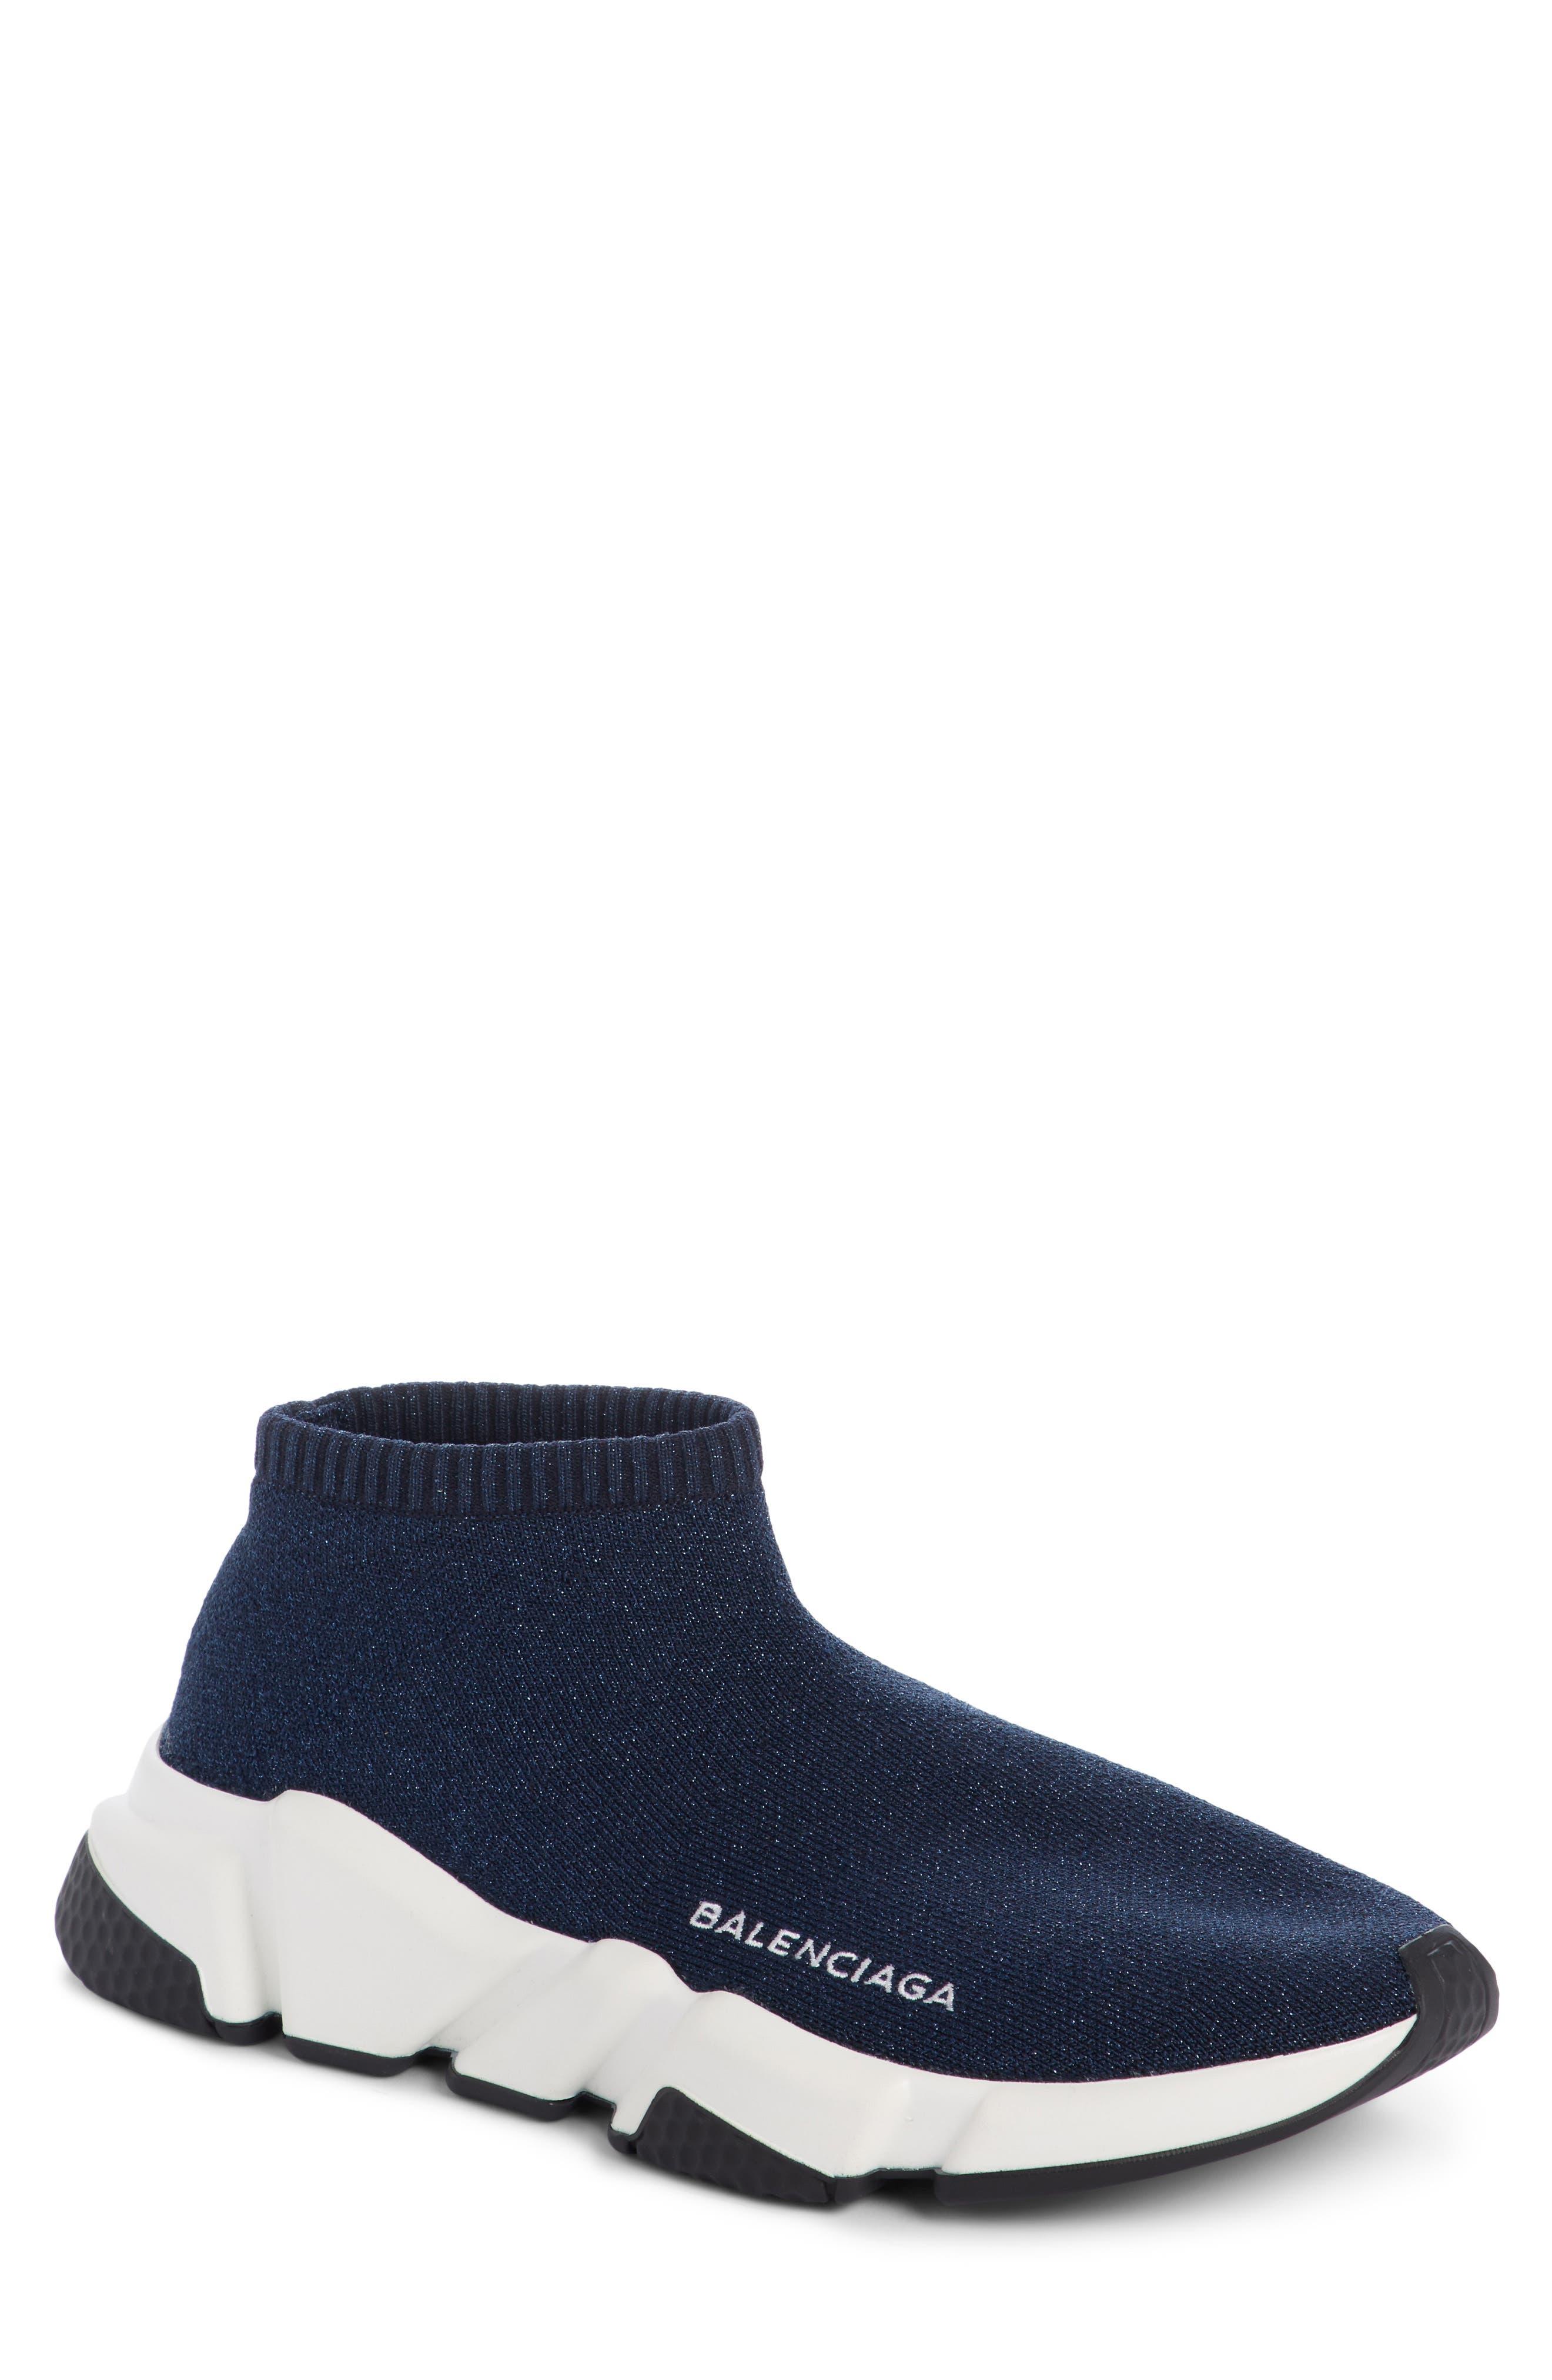 Alternate Image 1 Selected - Balenciaga Low Speed Sneaker (Women)